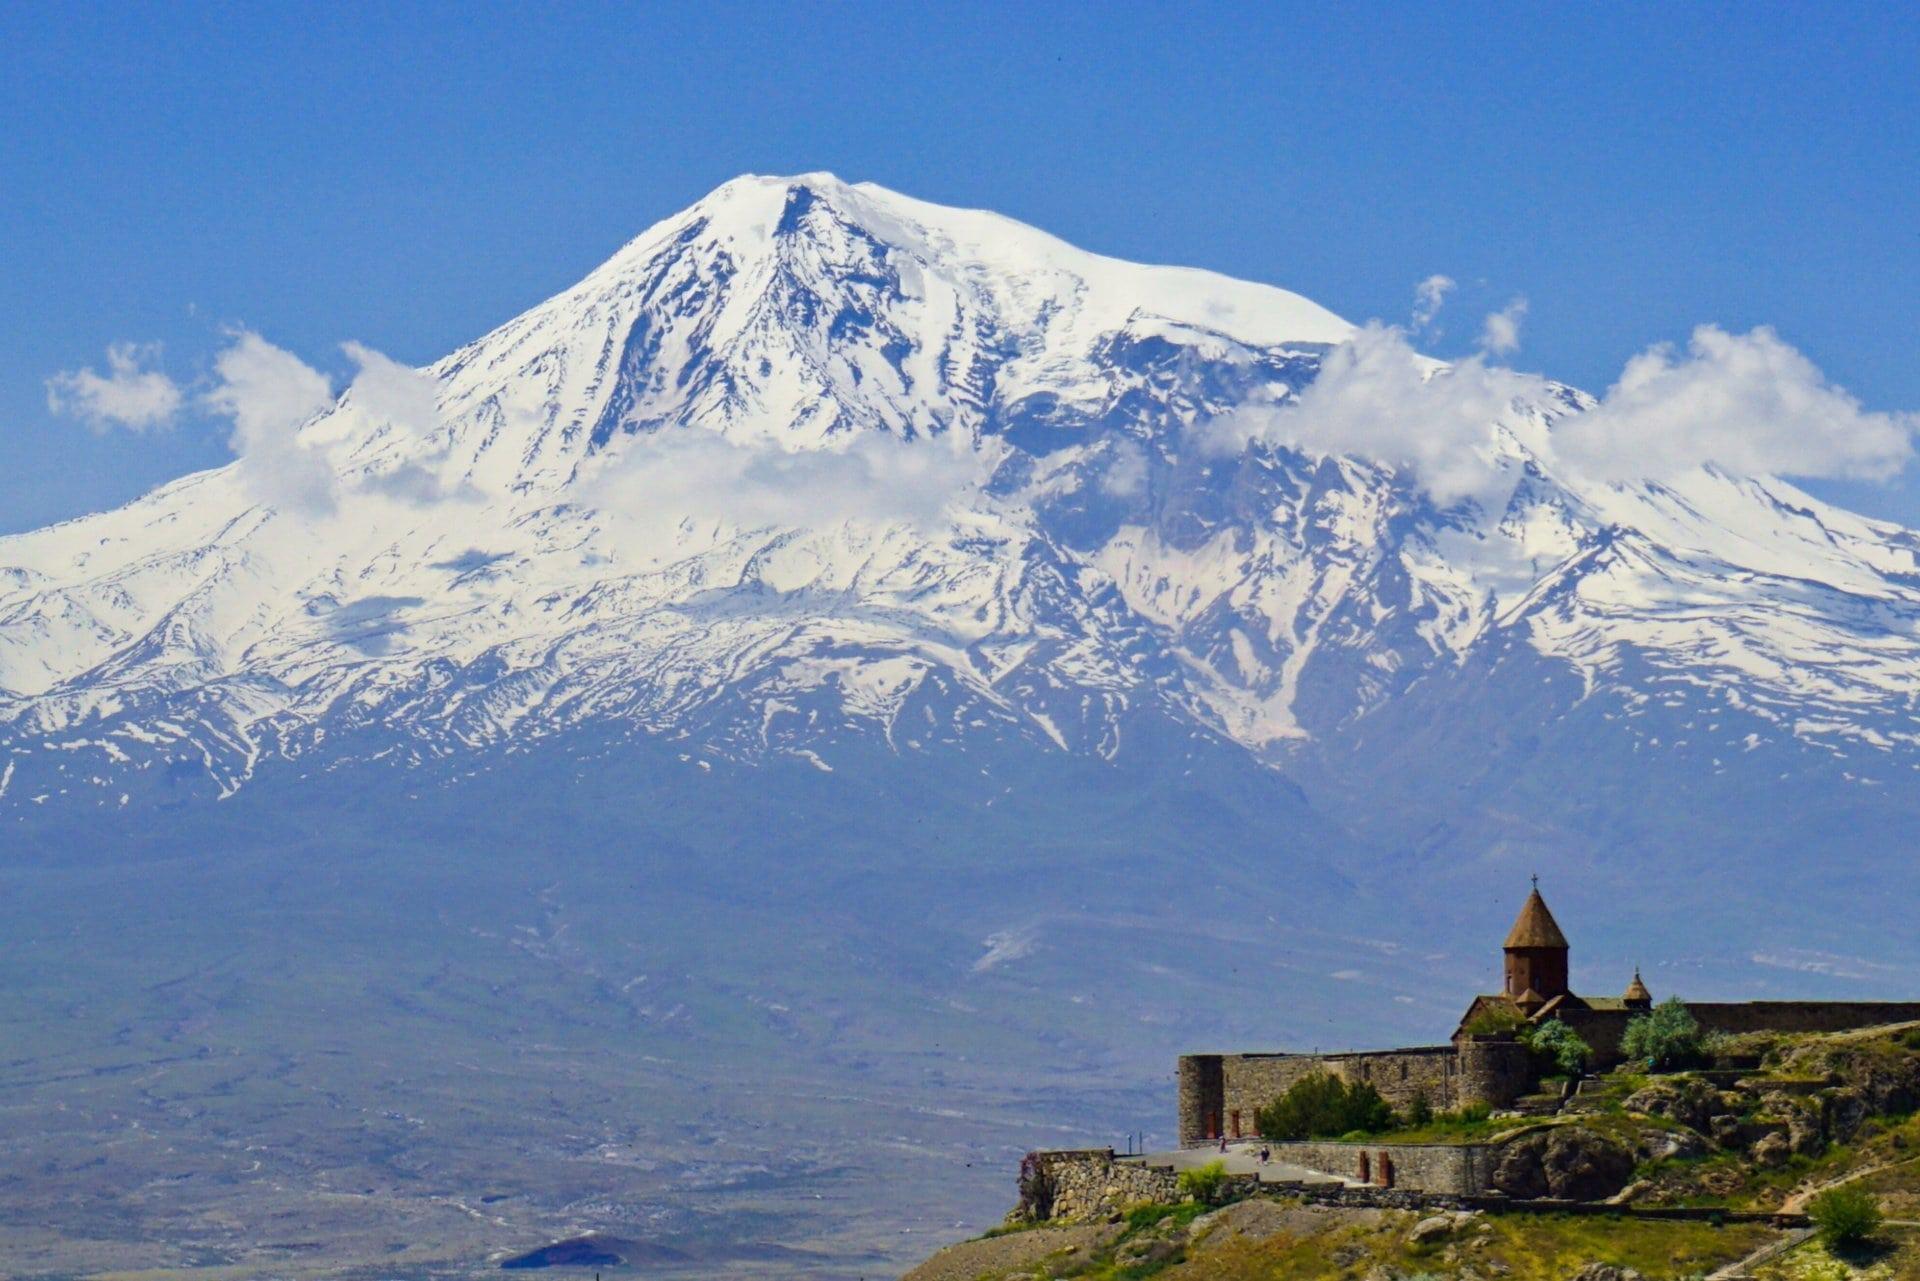 Khor Virap monastery, Armenia - Experiencing the Globe